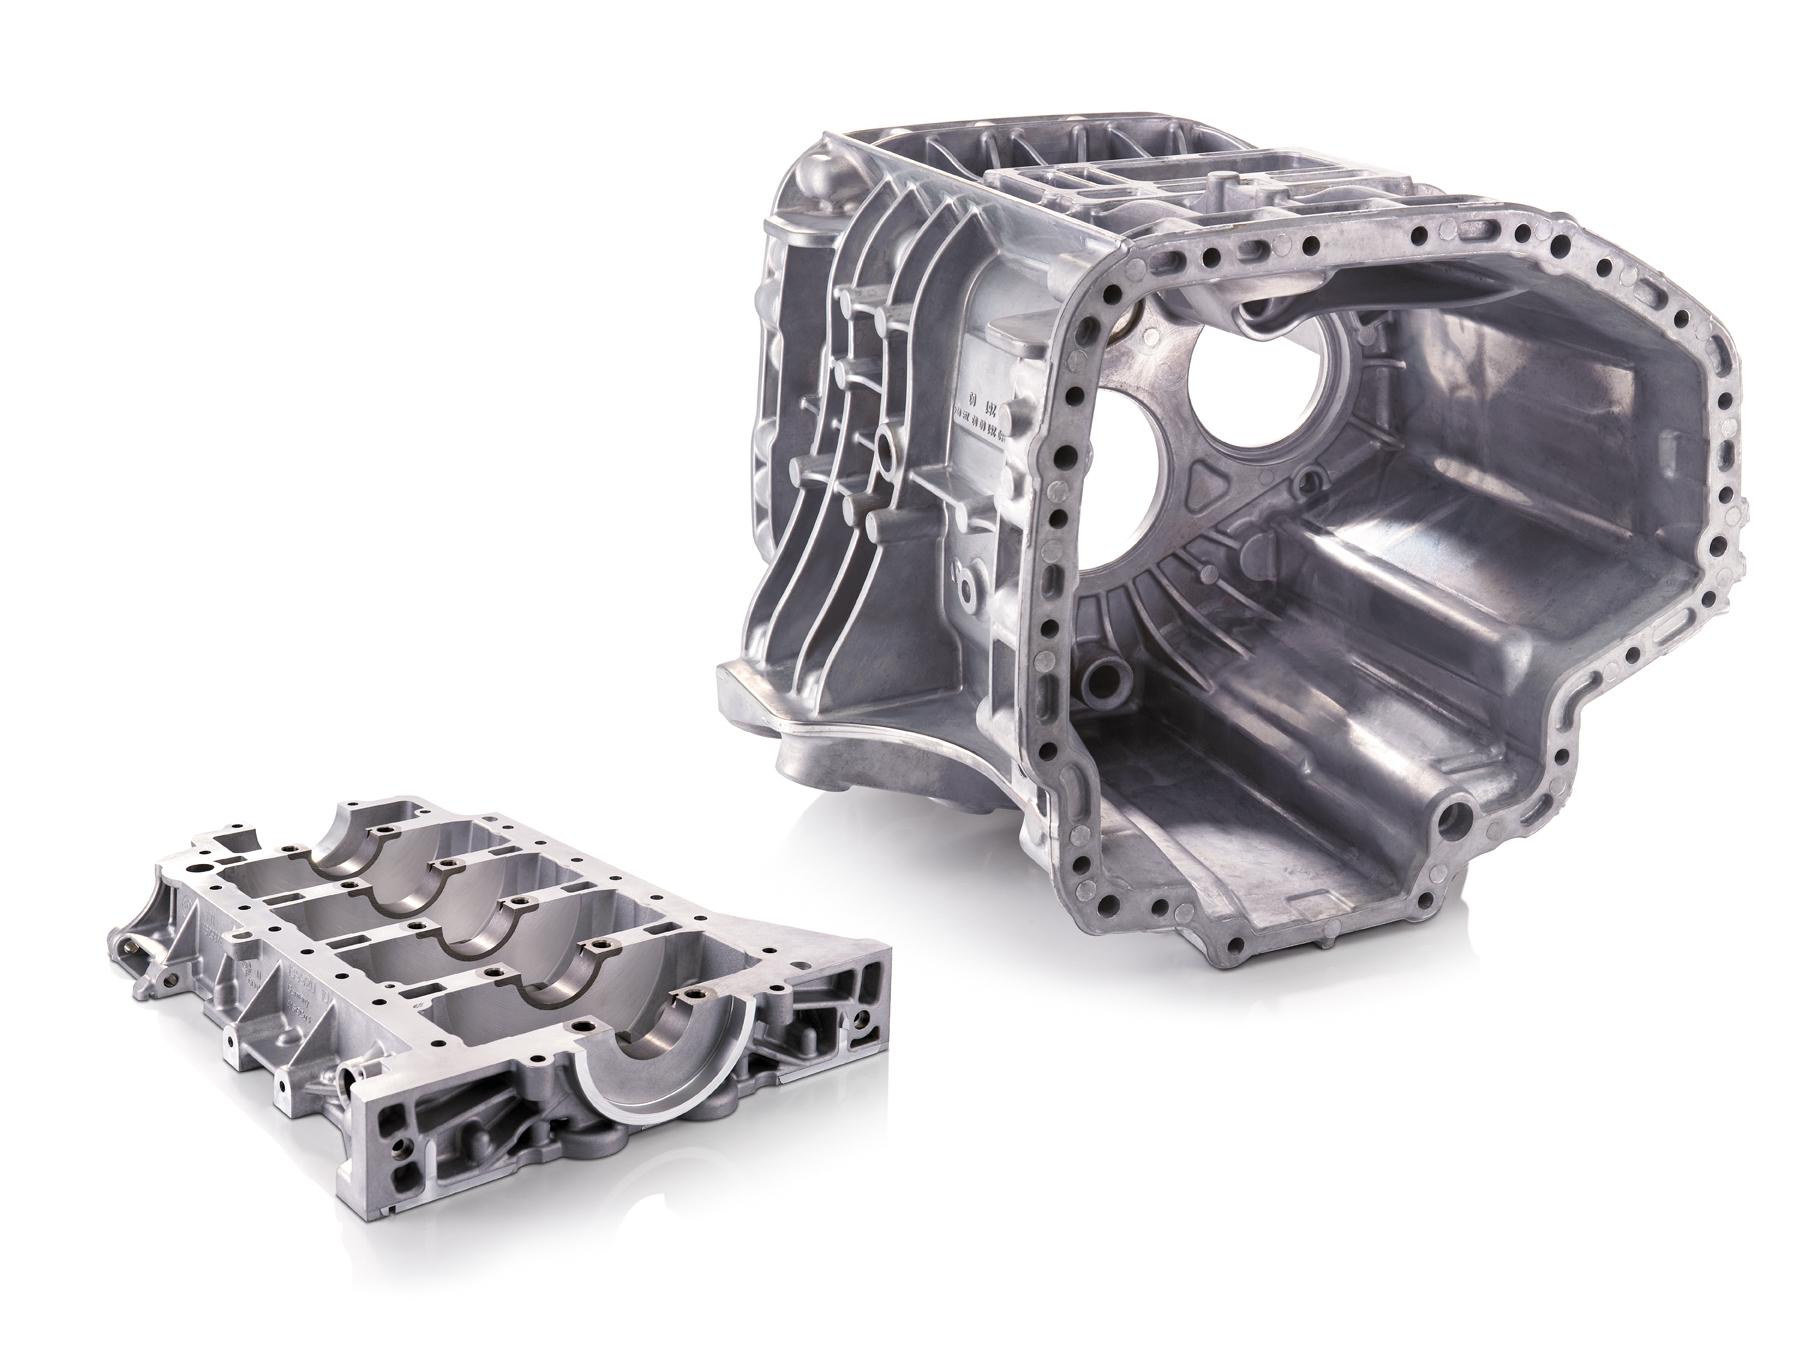 File:LKW-Getriebe und Bedplate-1.jpg